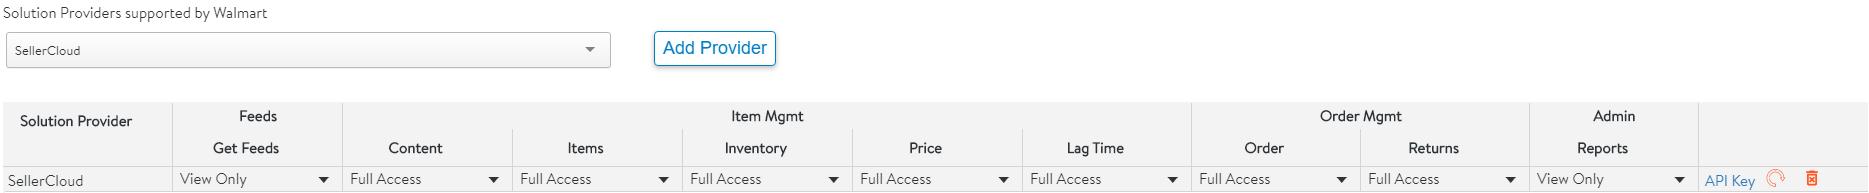 Updating Walmart Marketplace Integration To Open Authorization